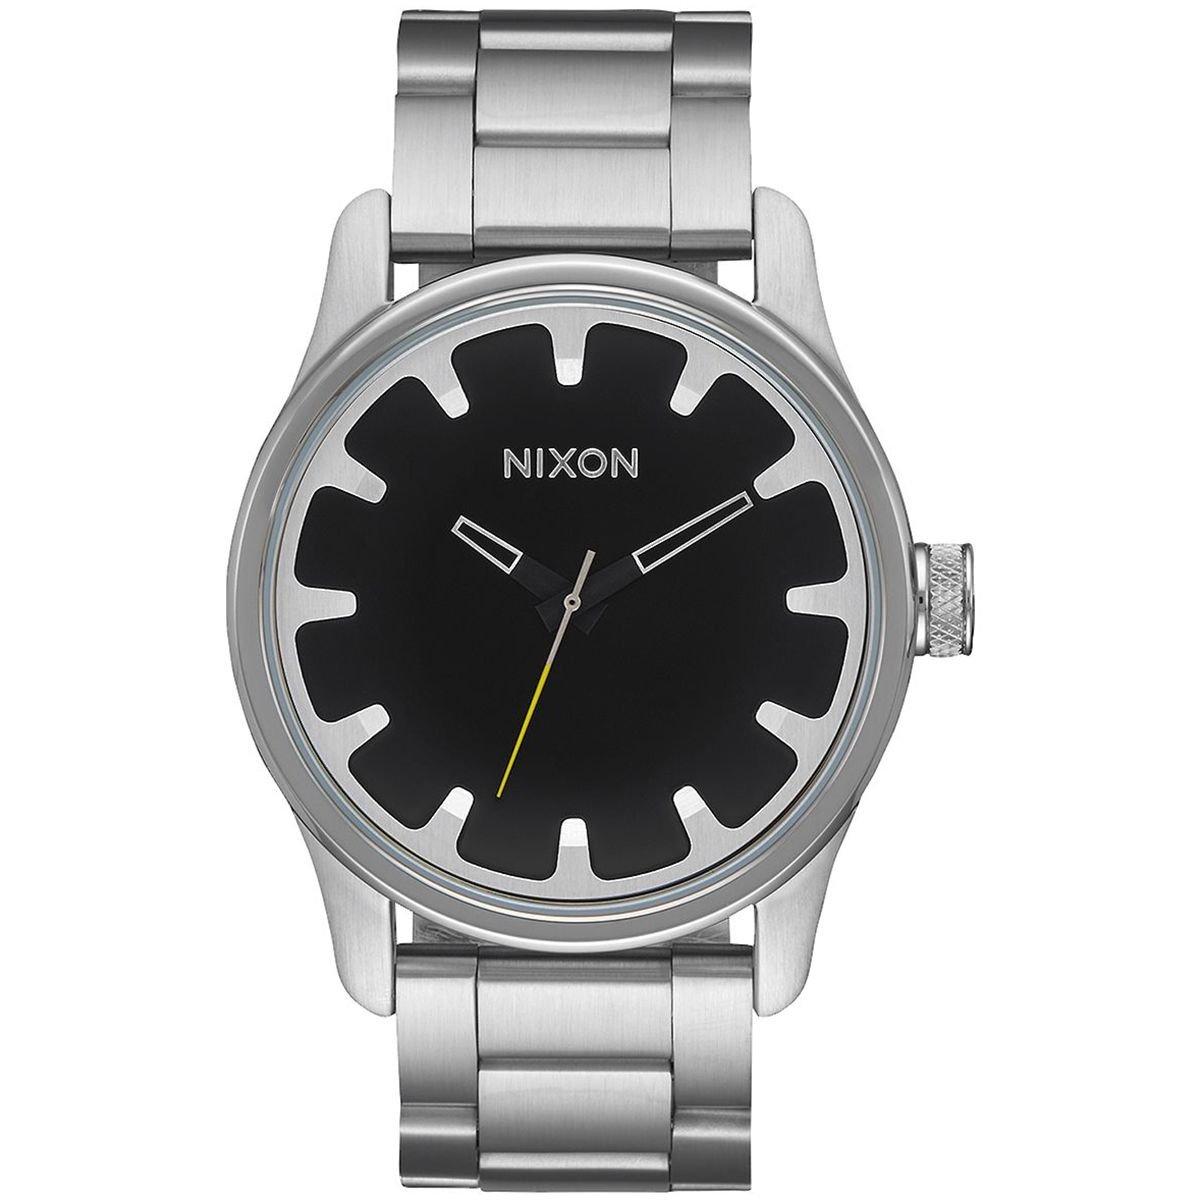 Nixonユニセックスドライバコレクション One Size ブラック B01B3VJULY ブラック ブラック